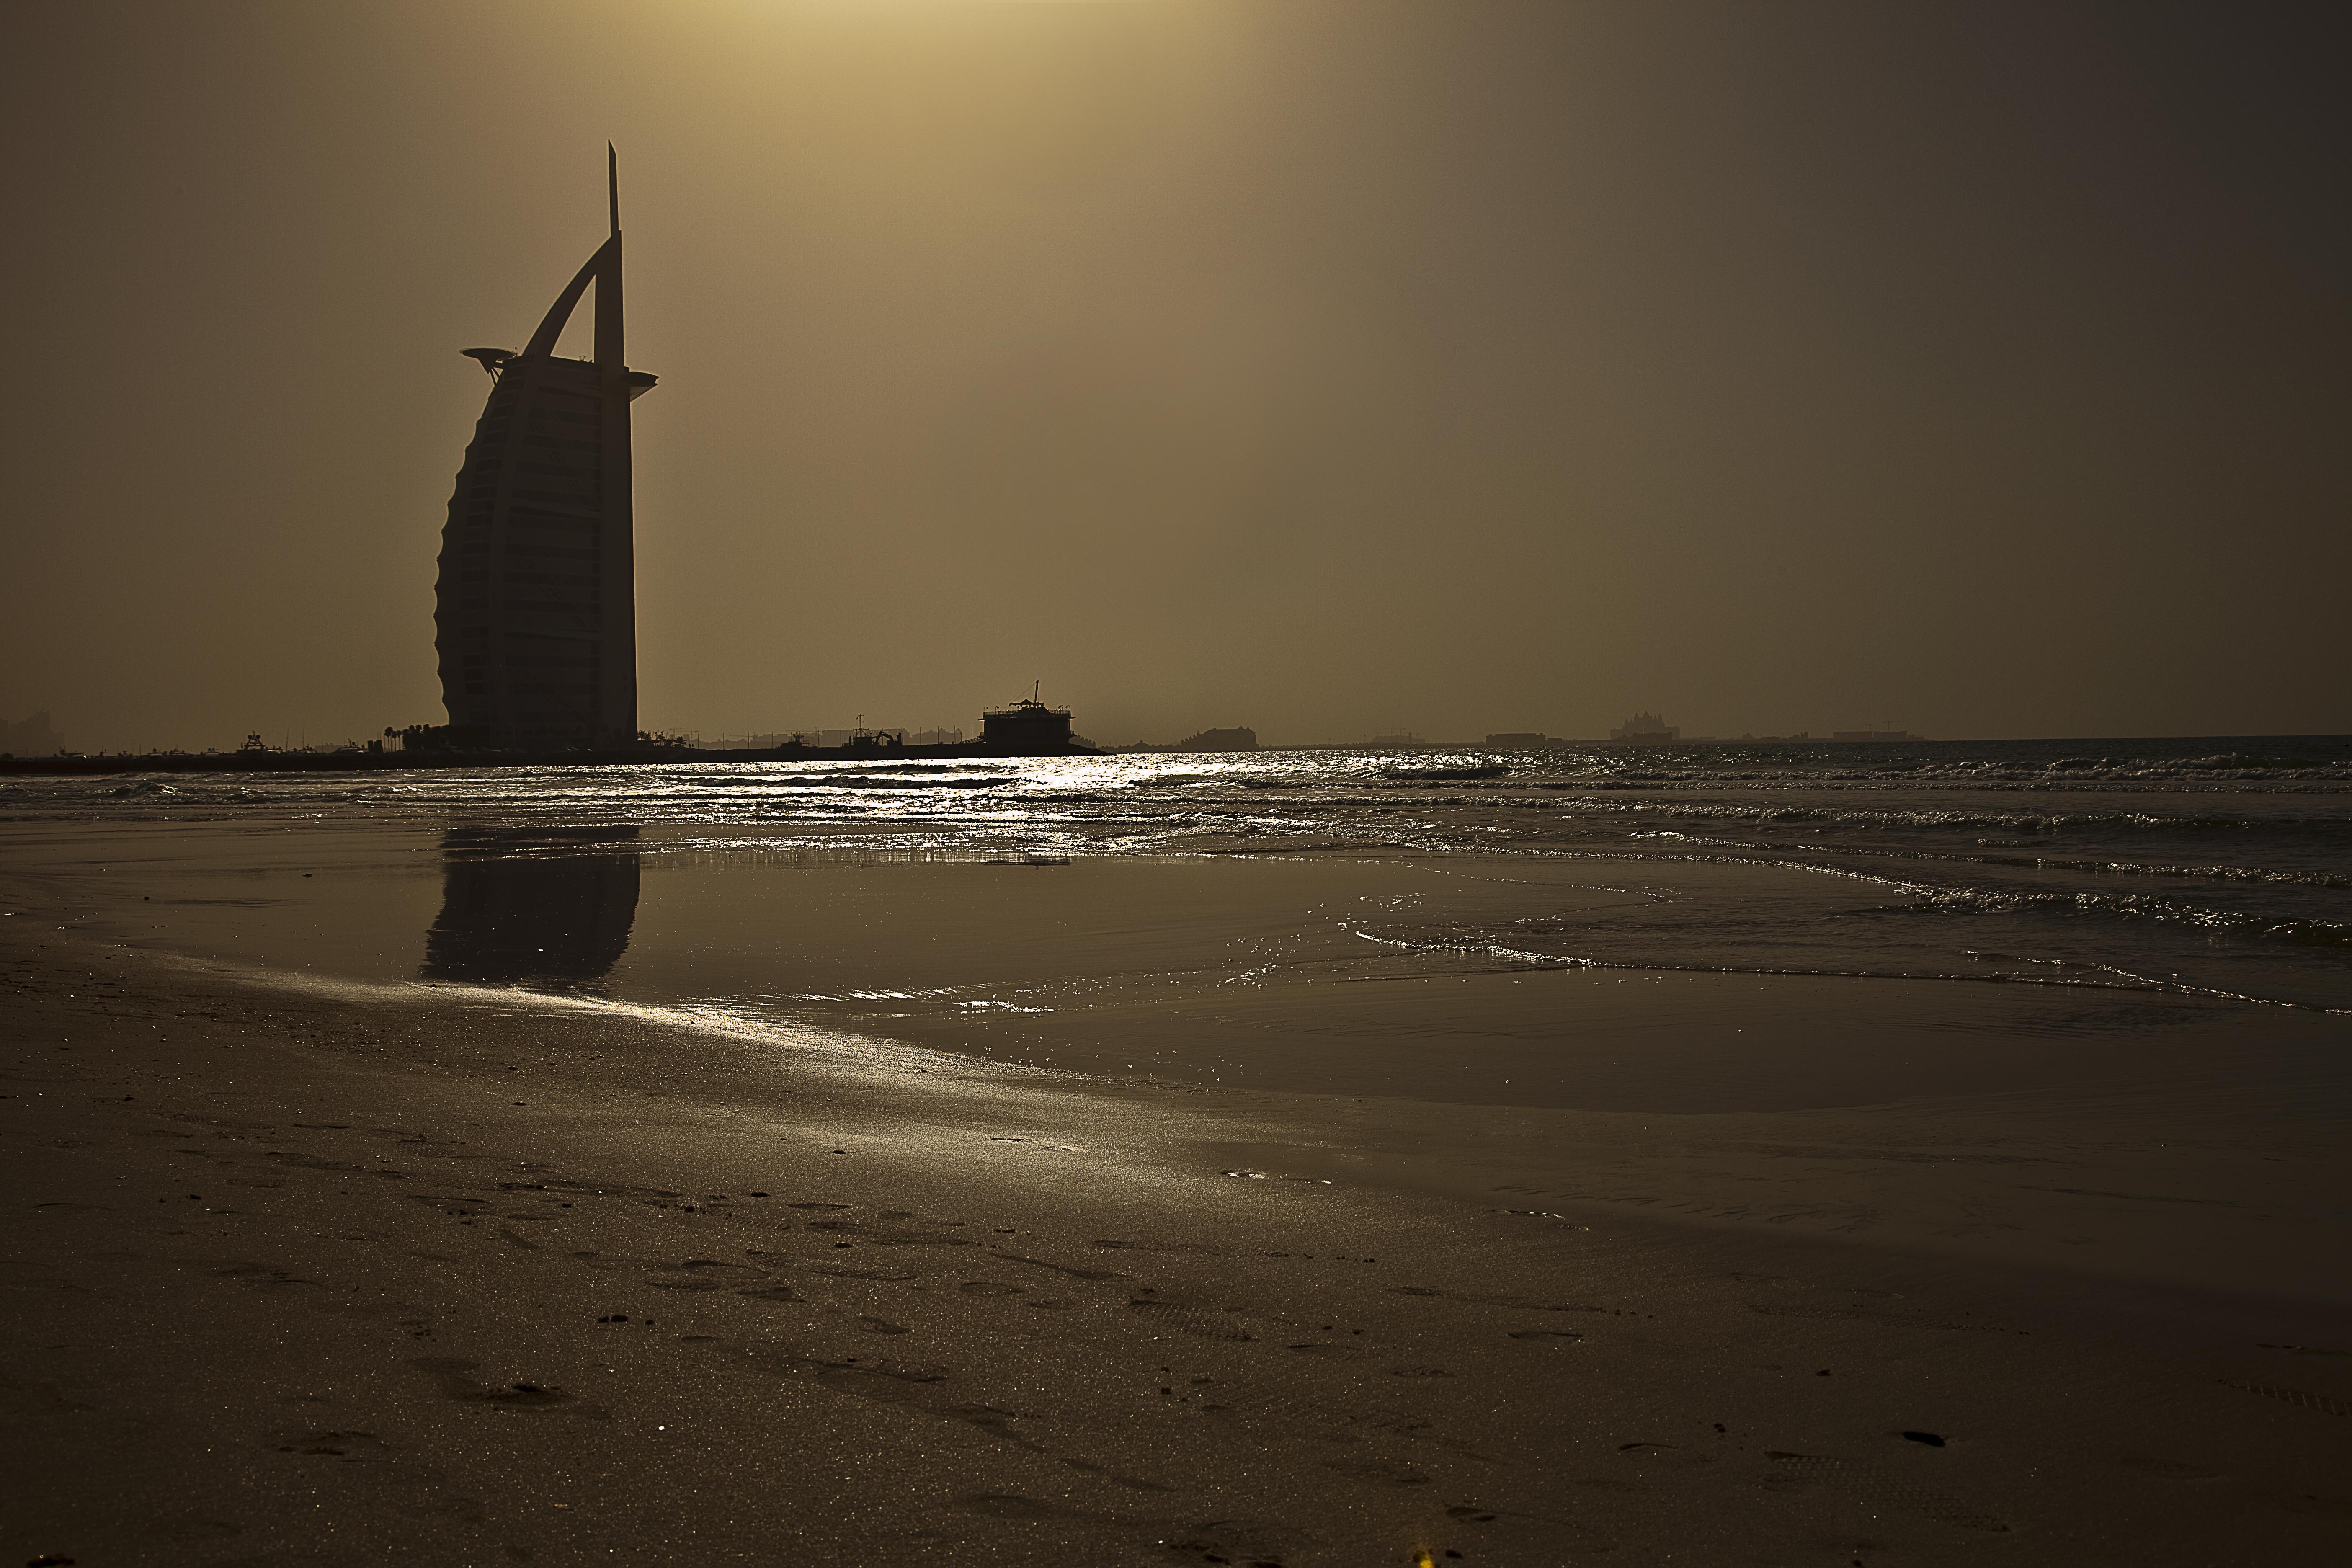 Burj al arab sailboat hotel photo